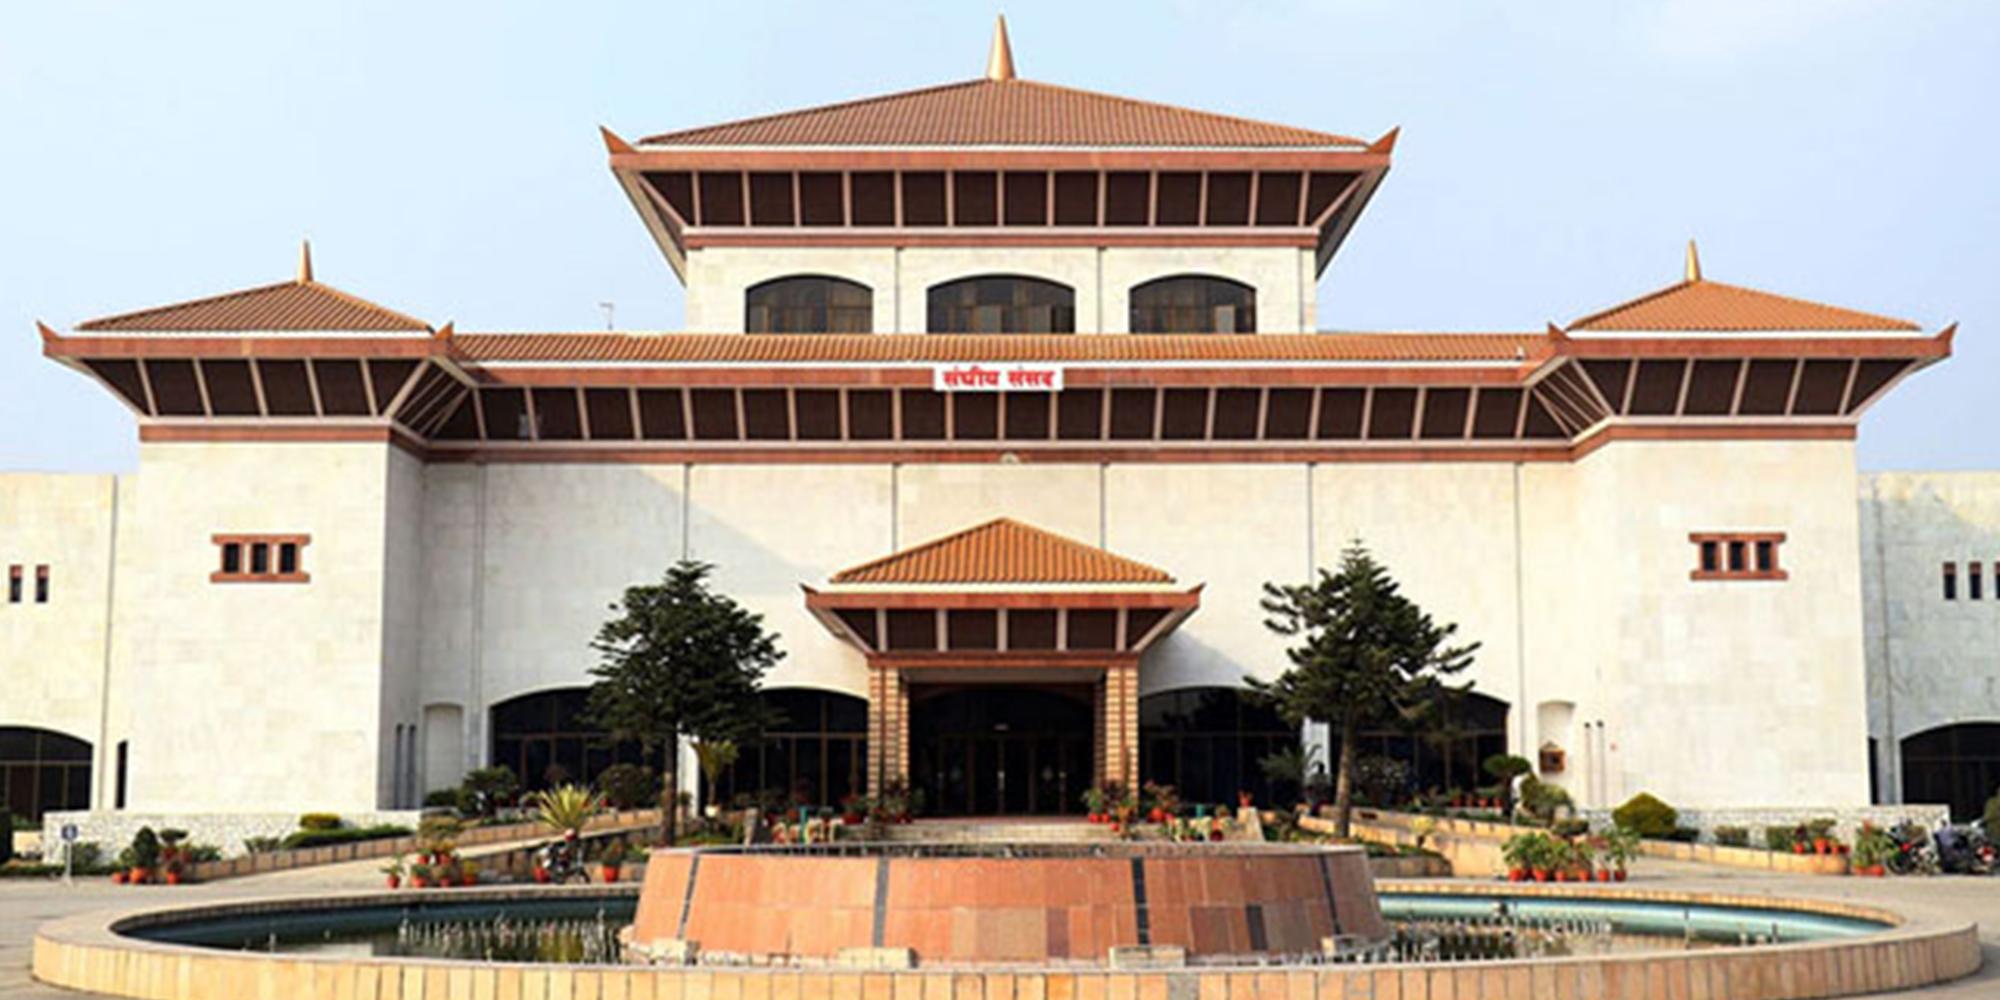 संसदबाट  संविधान संशोधन विधेयक आज पारित हुने